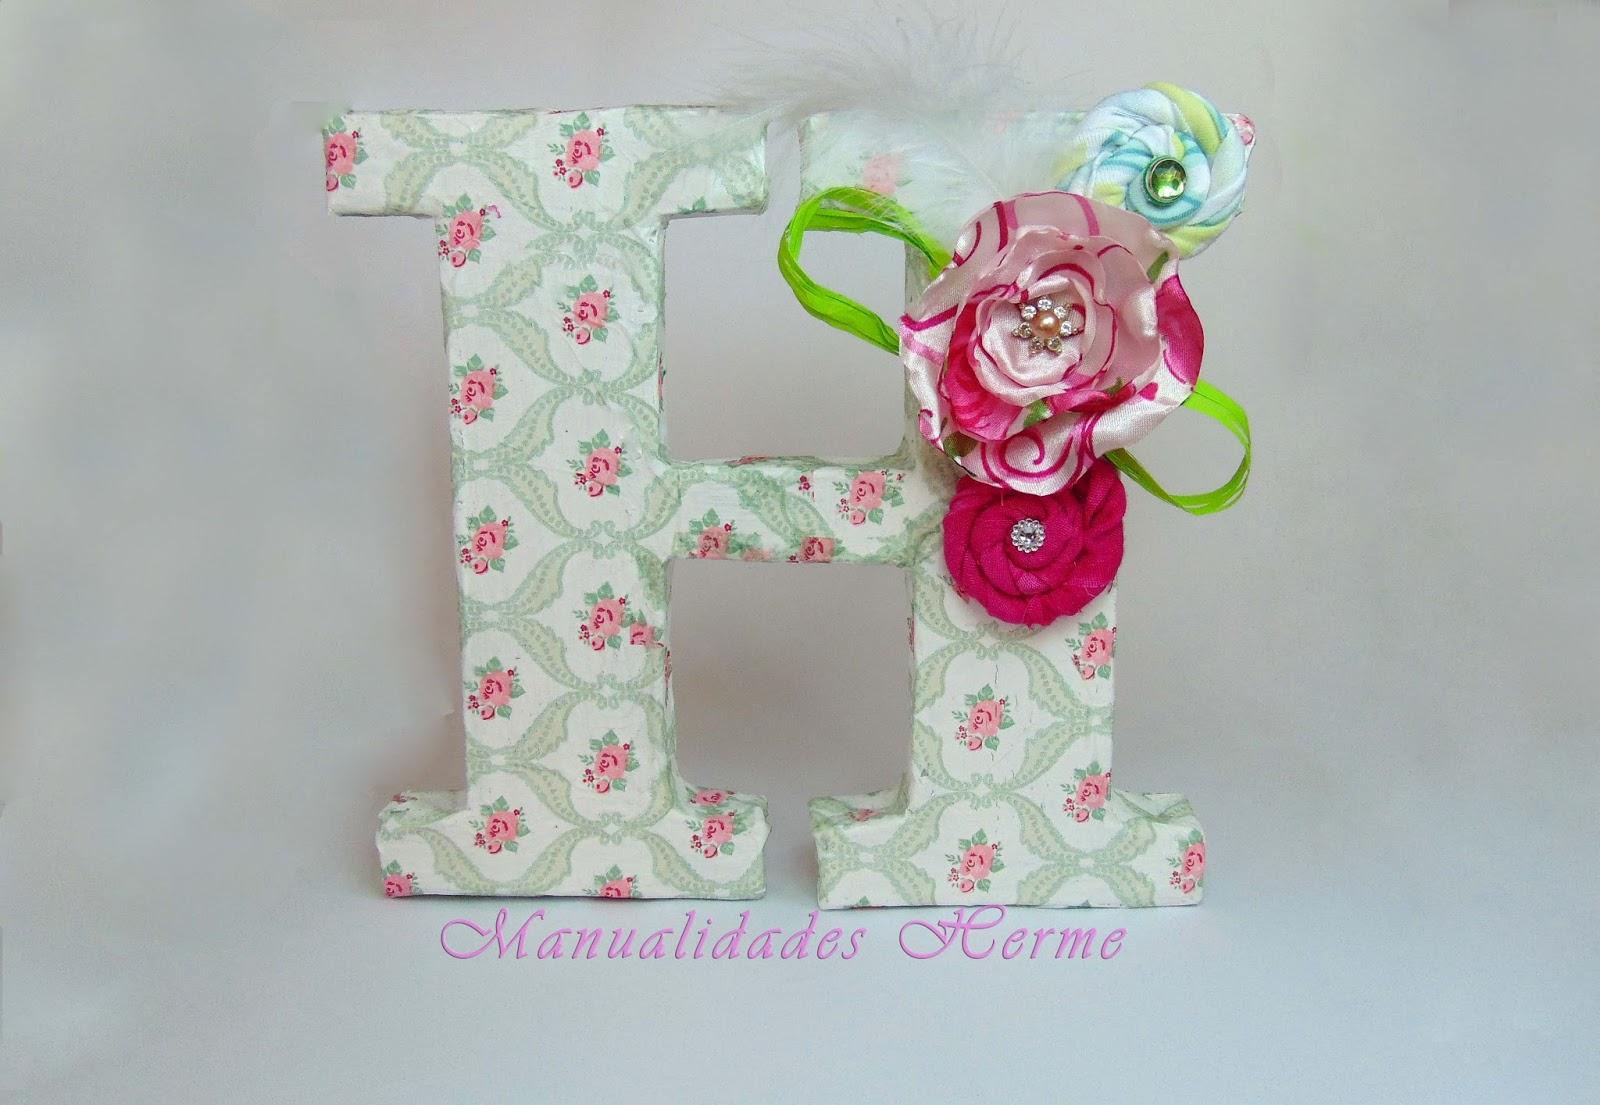 Materiales para cartapesta aprender manualidades es - Hacer manualidades para decorar ...